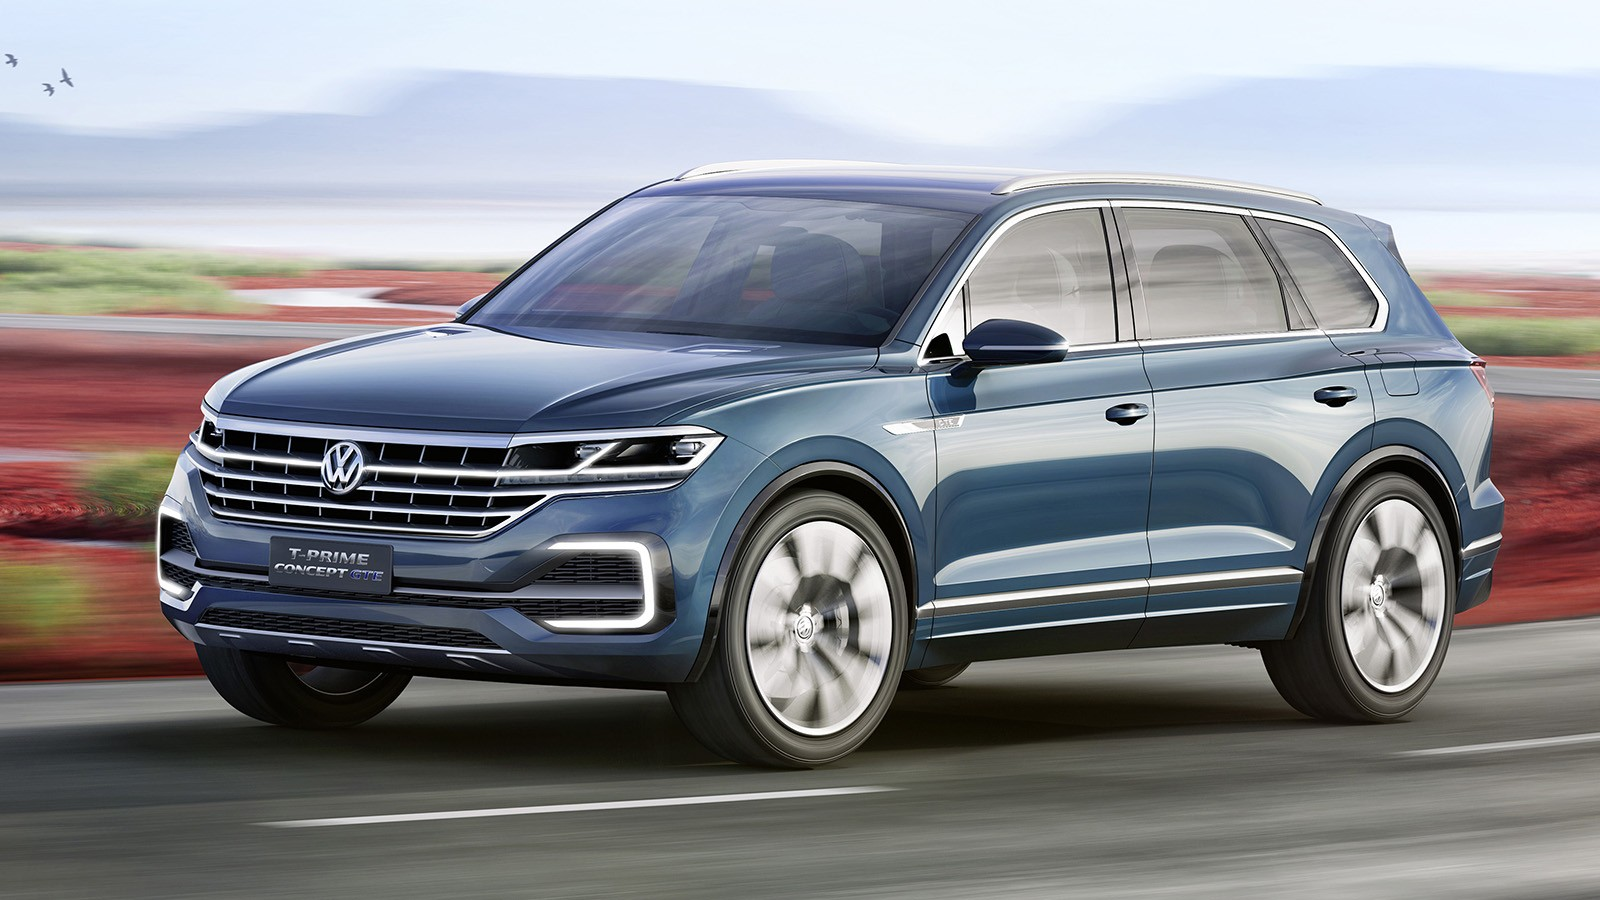 На фото: Volkswagen T-Prime GTE Concept. Он стал прототипом для нового Туарега